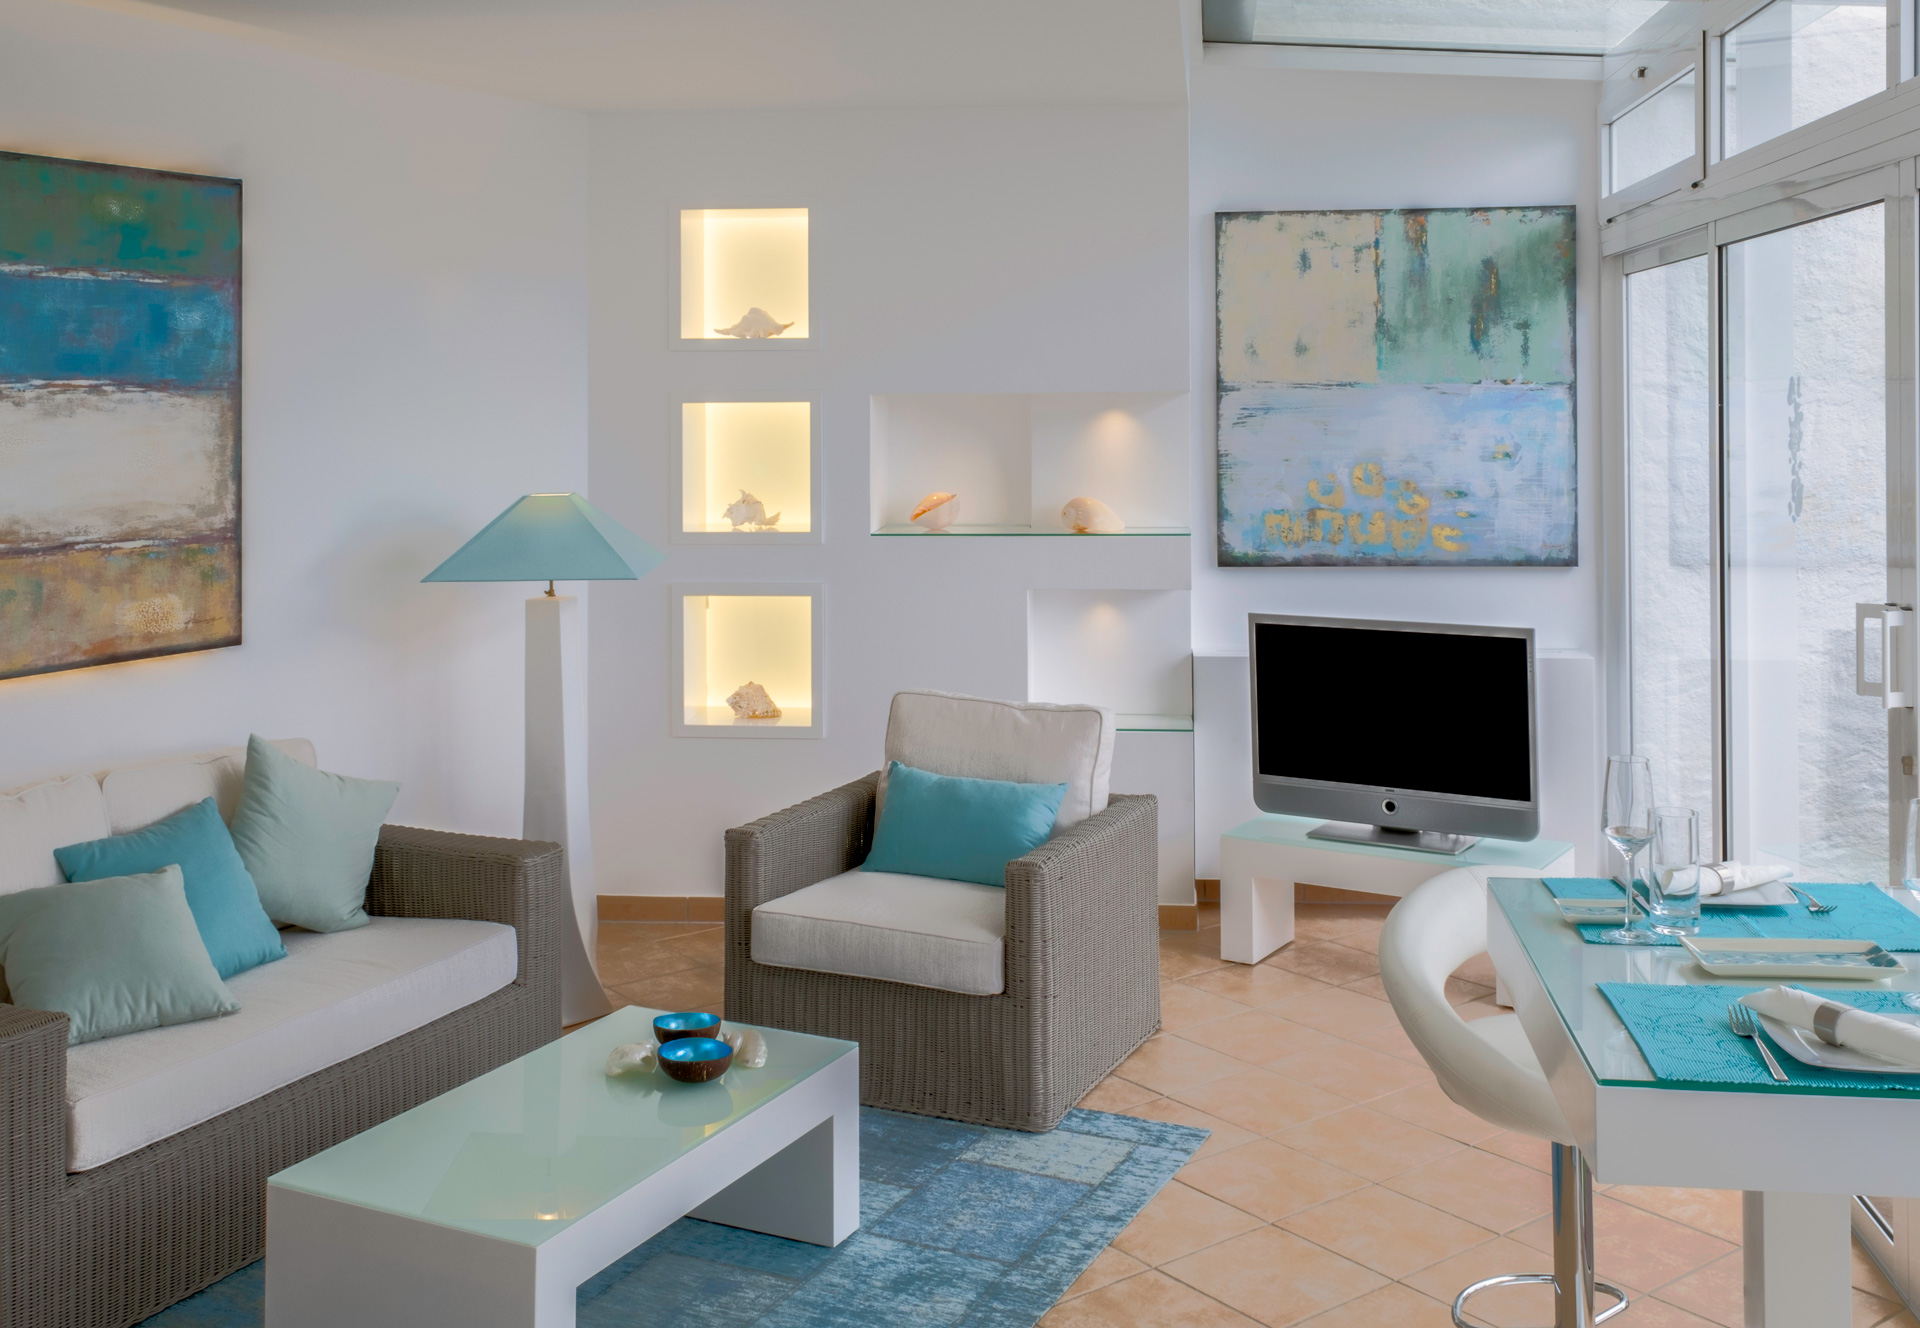 Casa San Marco im Jardin de la Paz: Design-Suite mit Meerblick